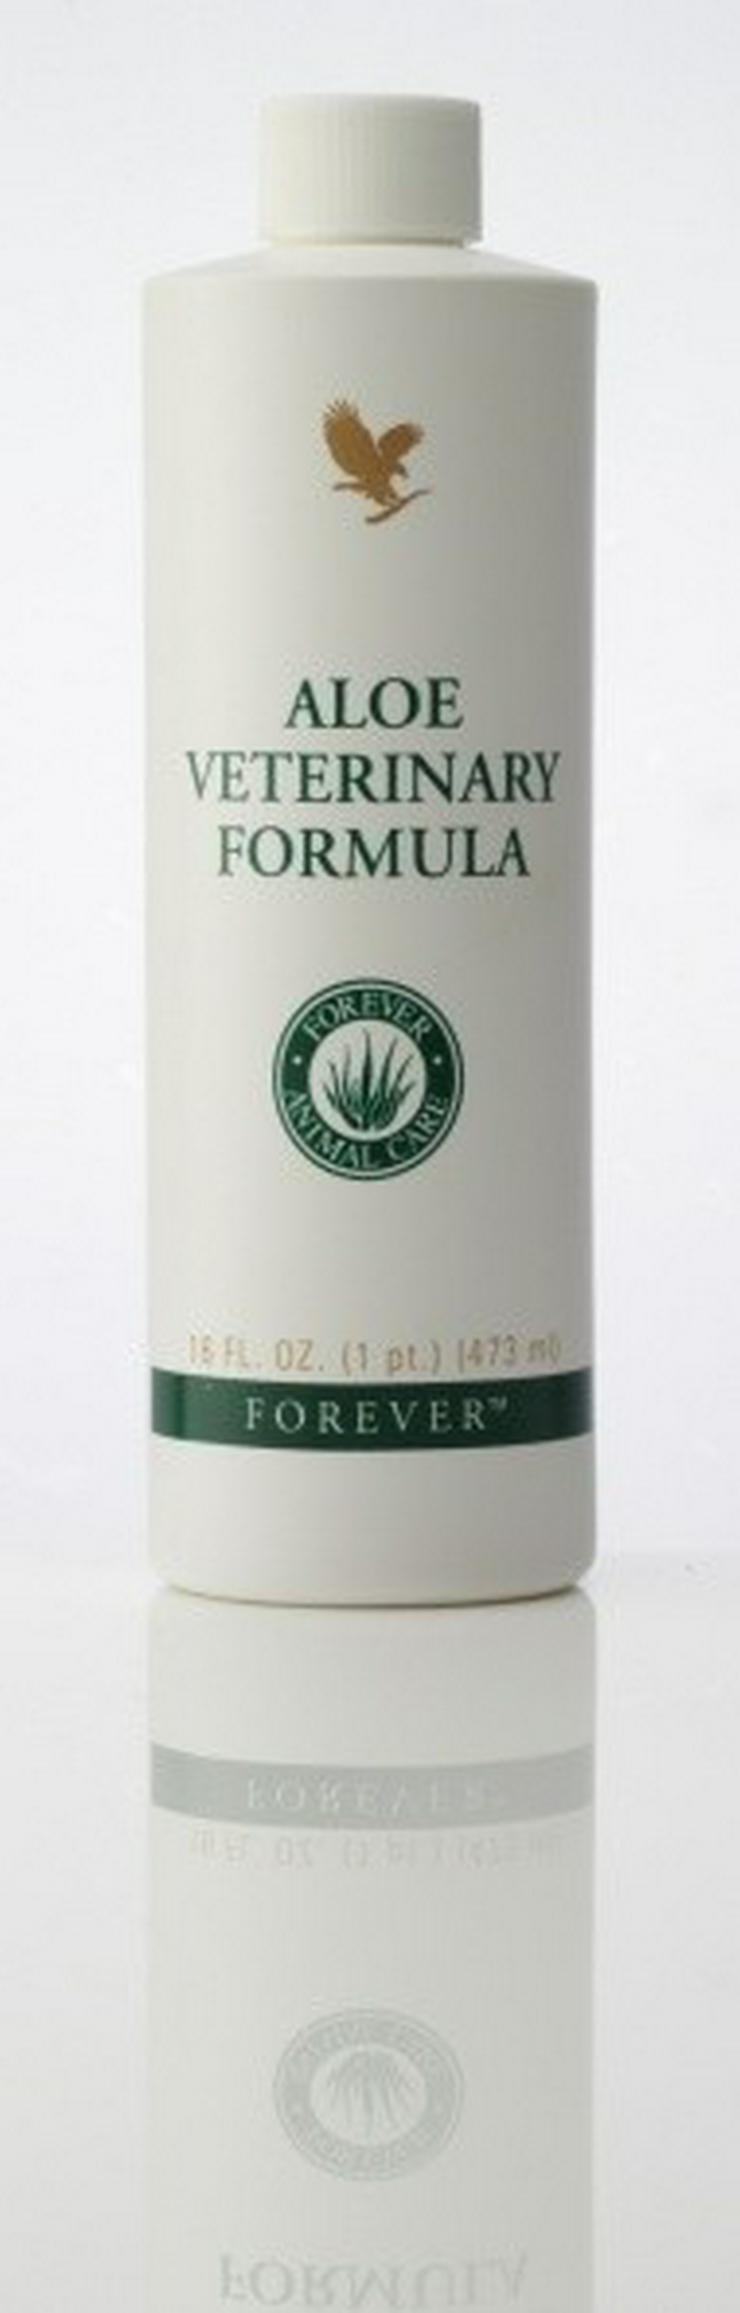 Bild 2: Aloe Veterinary Formula ab 18,99 € - Staffelpreise